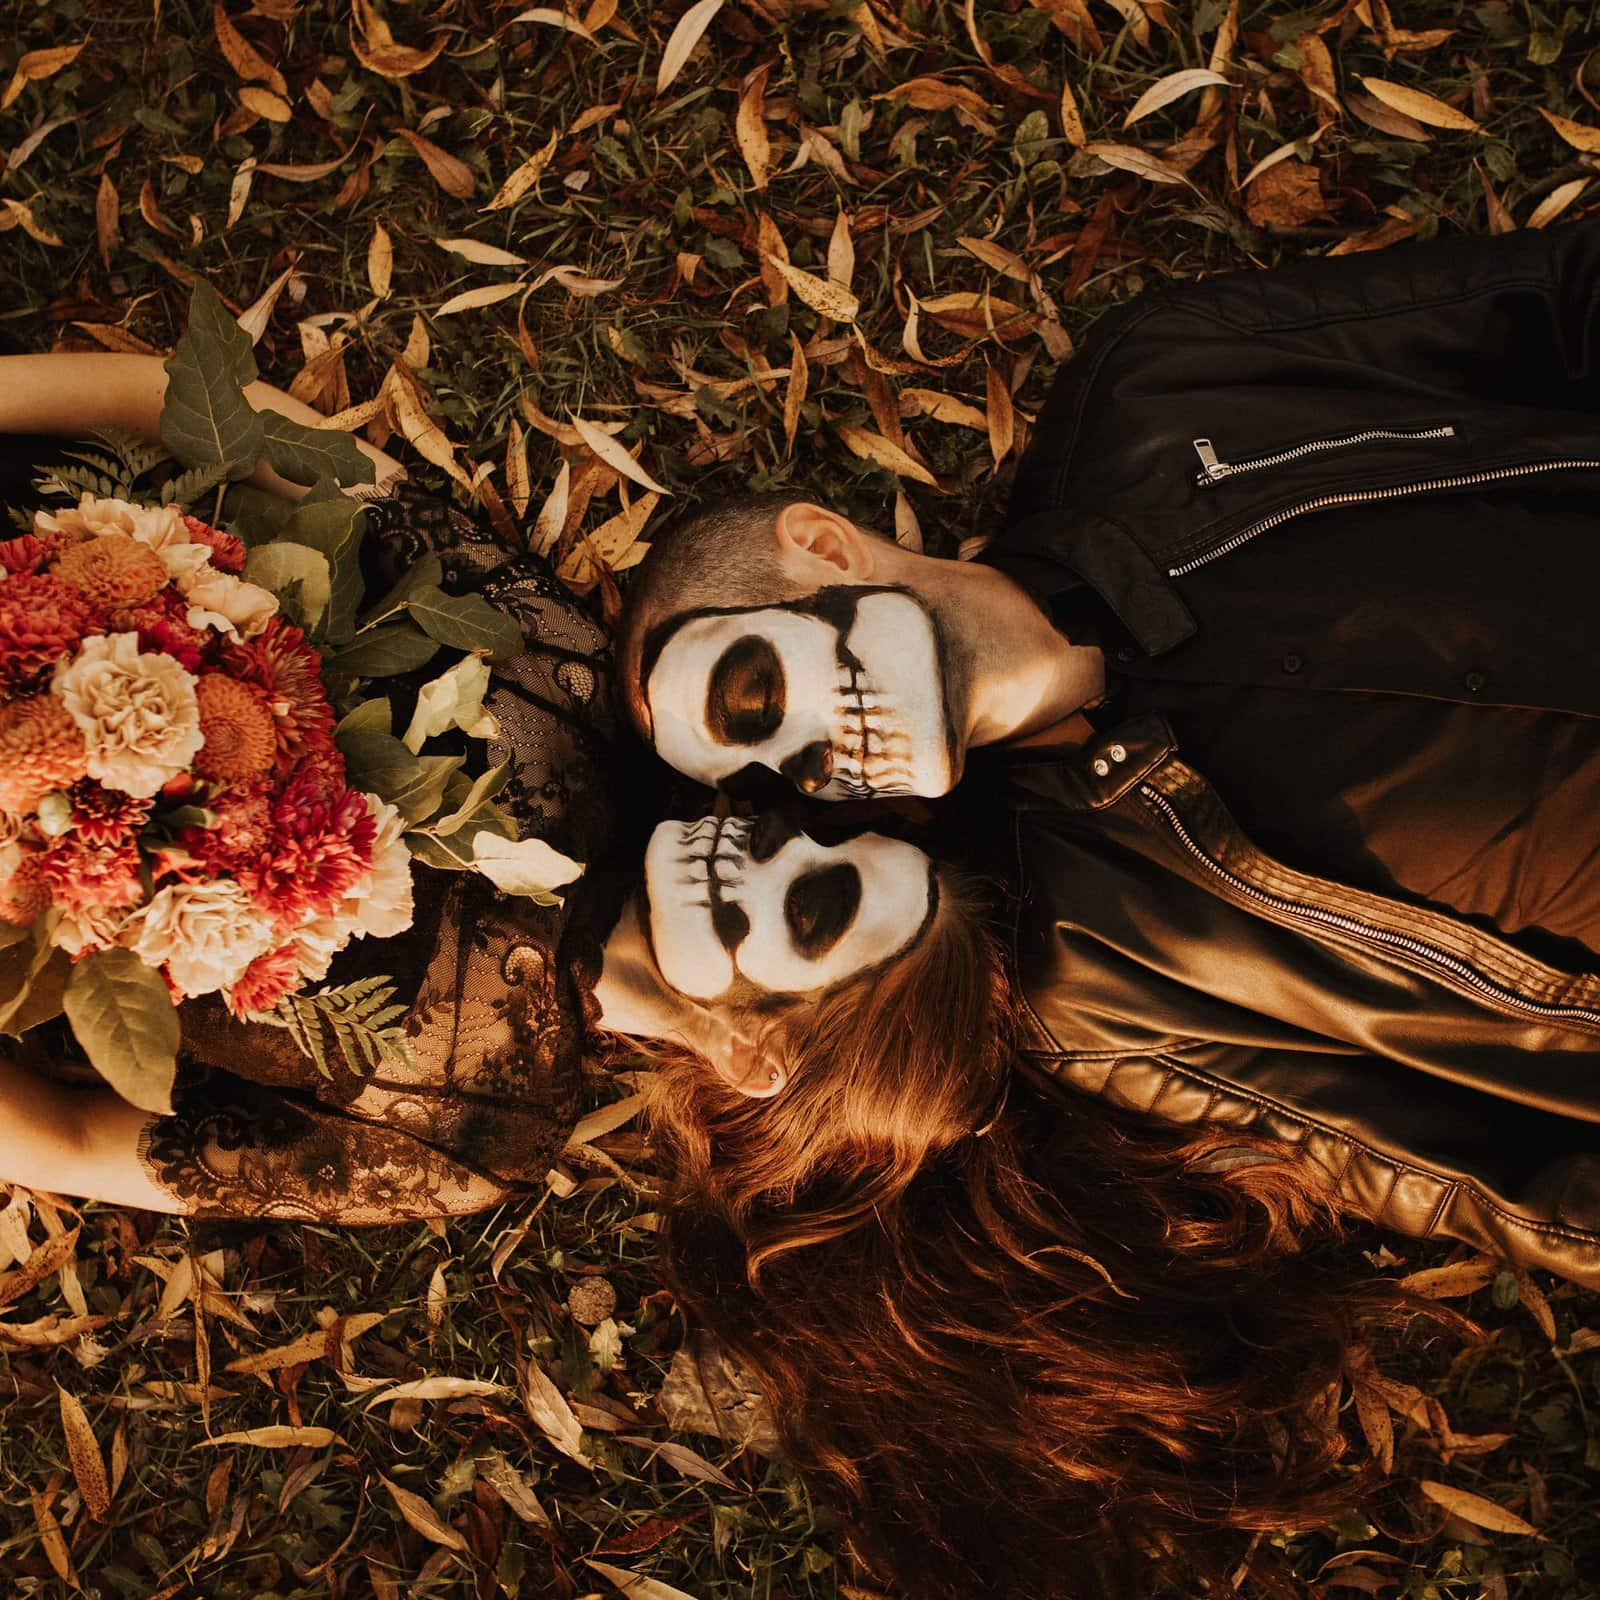 Halloween couple session.